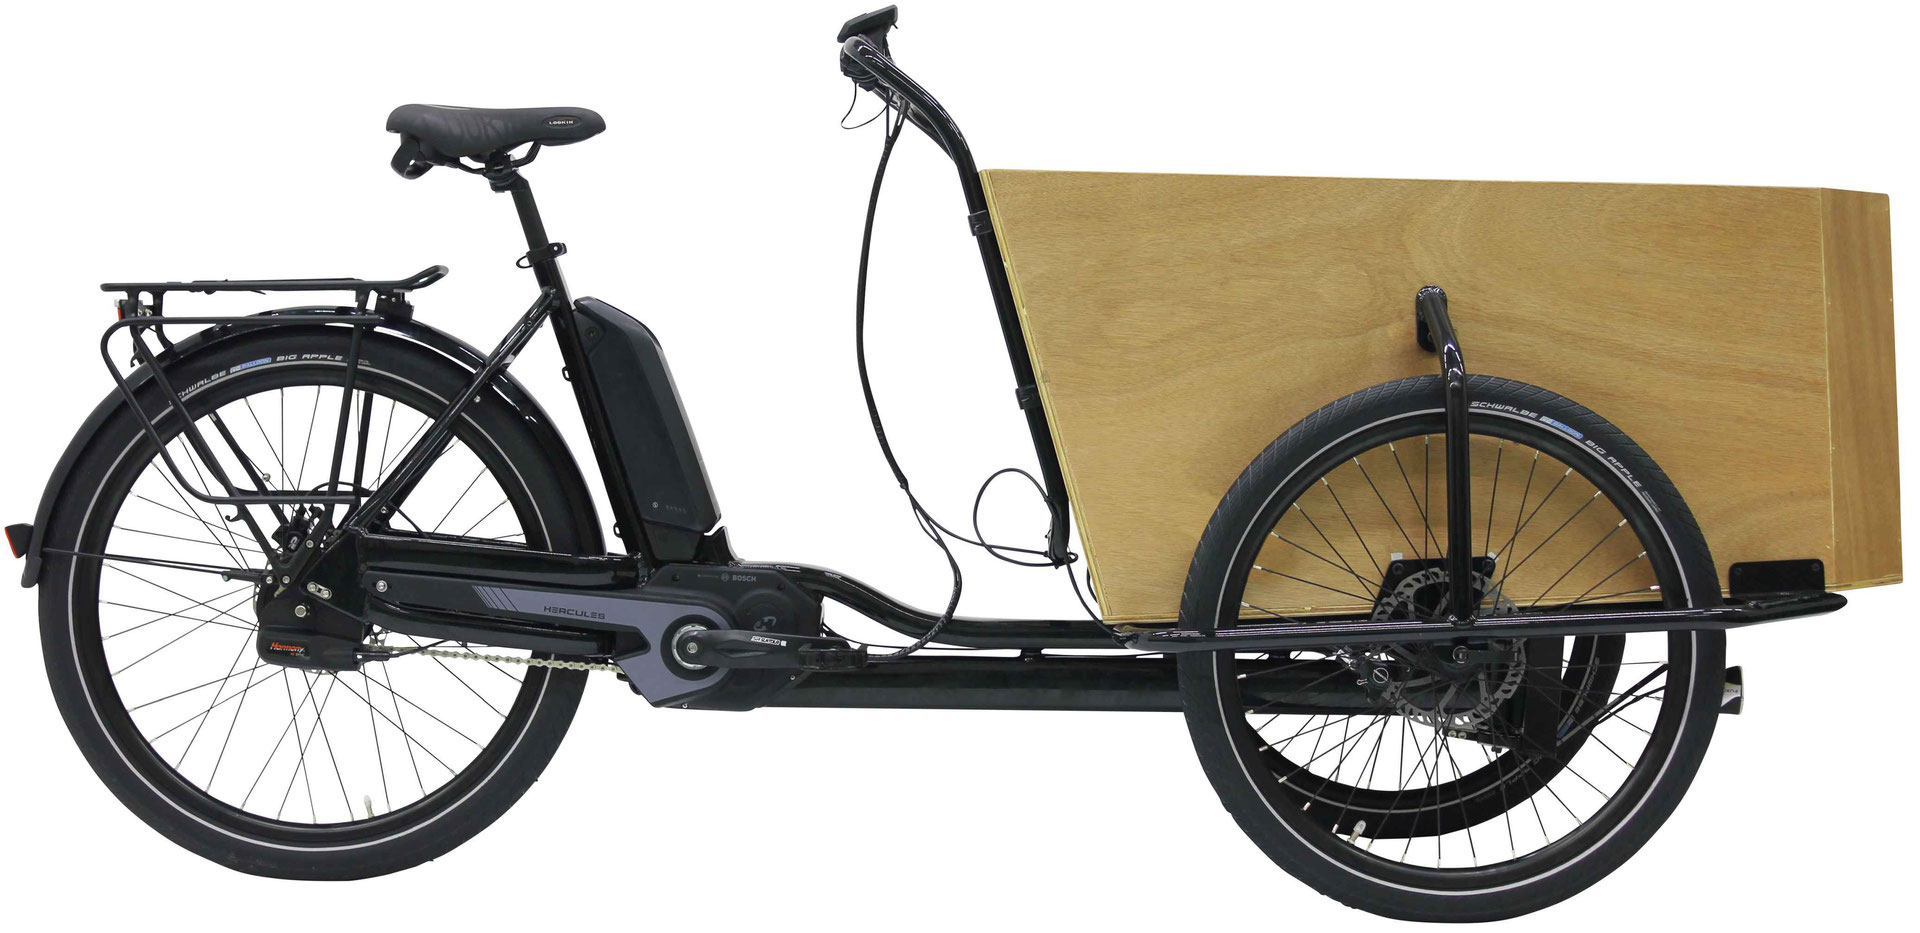 hercules porter e lasten e bike jetzt probefahren lastenfahrrad zentrum. Black Bedroom Furniture Sets. Home Design Ideas